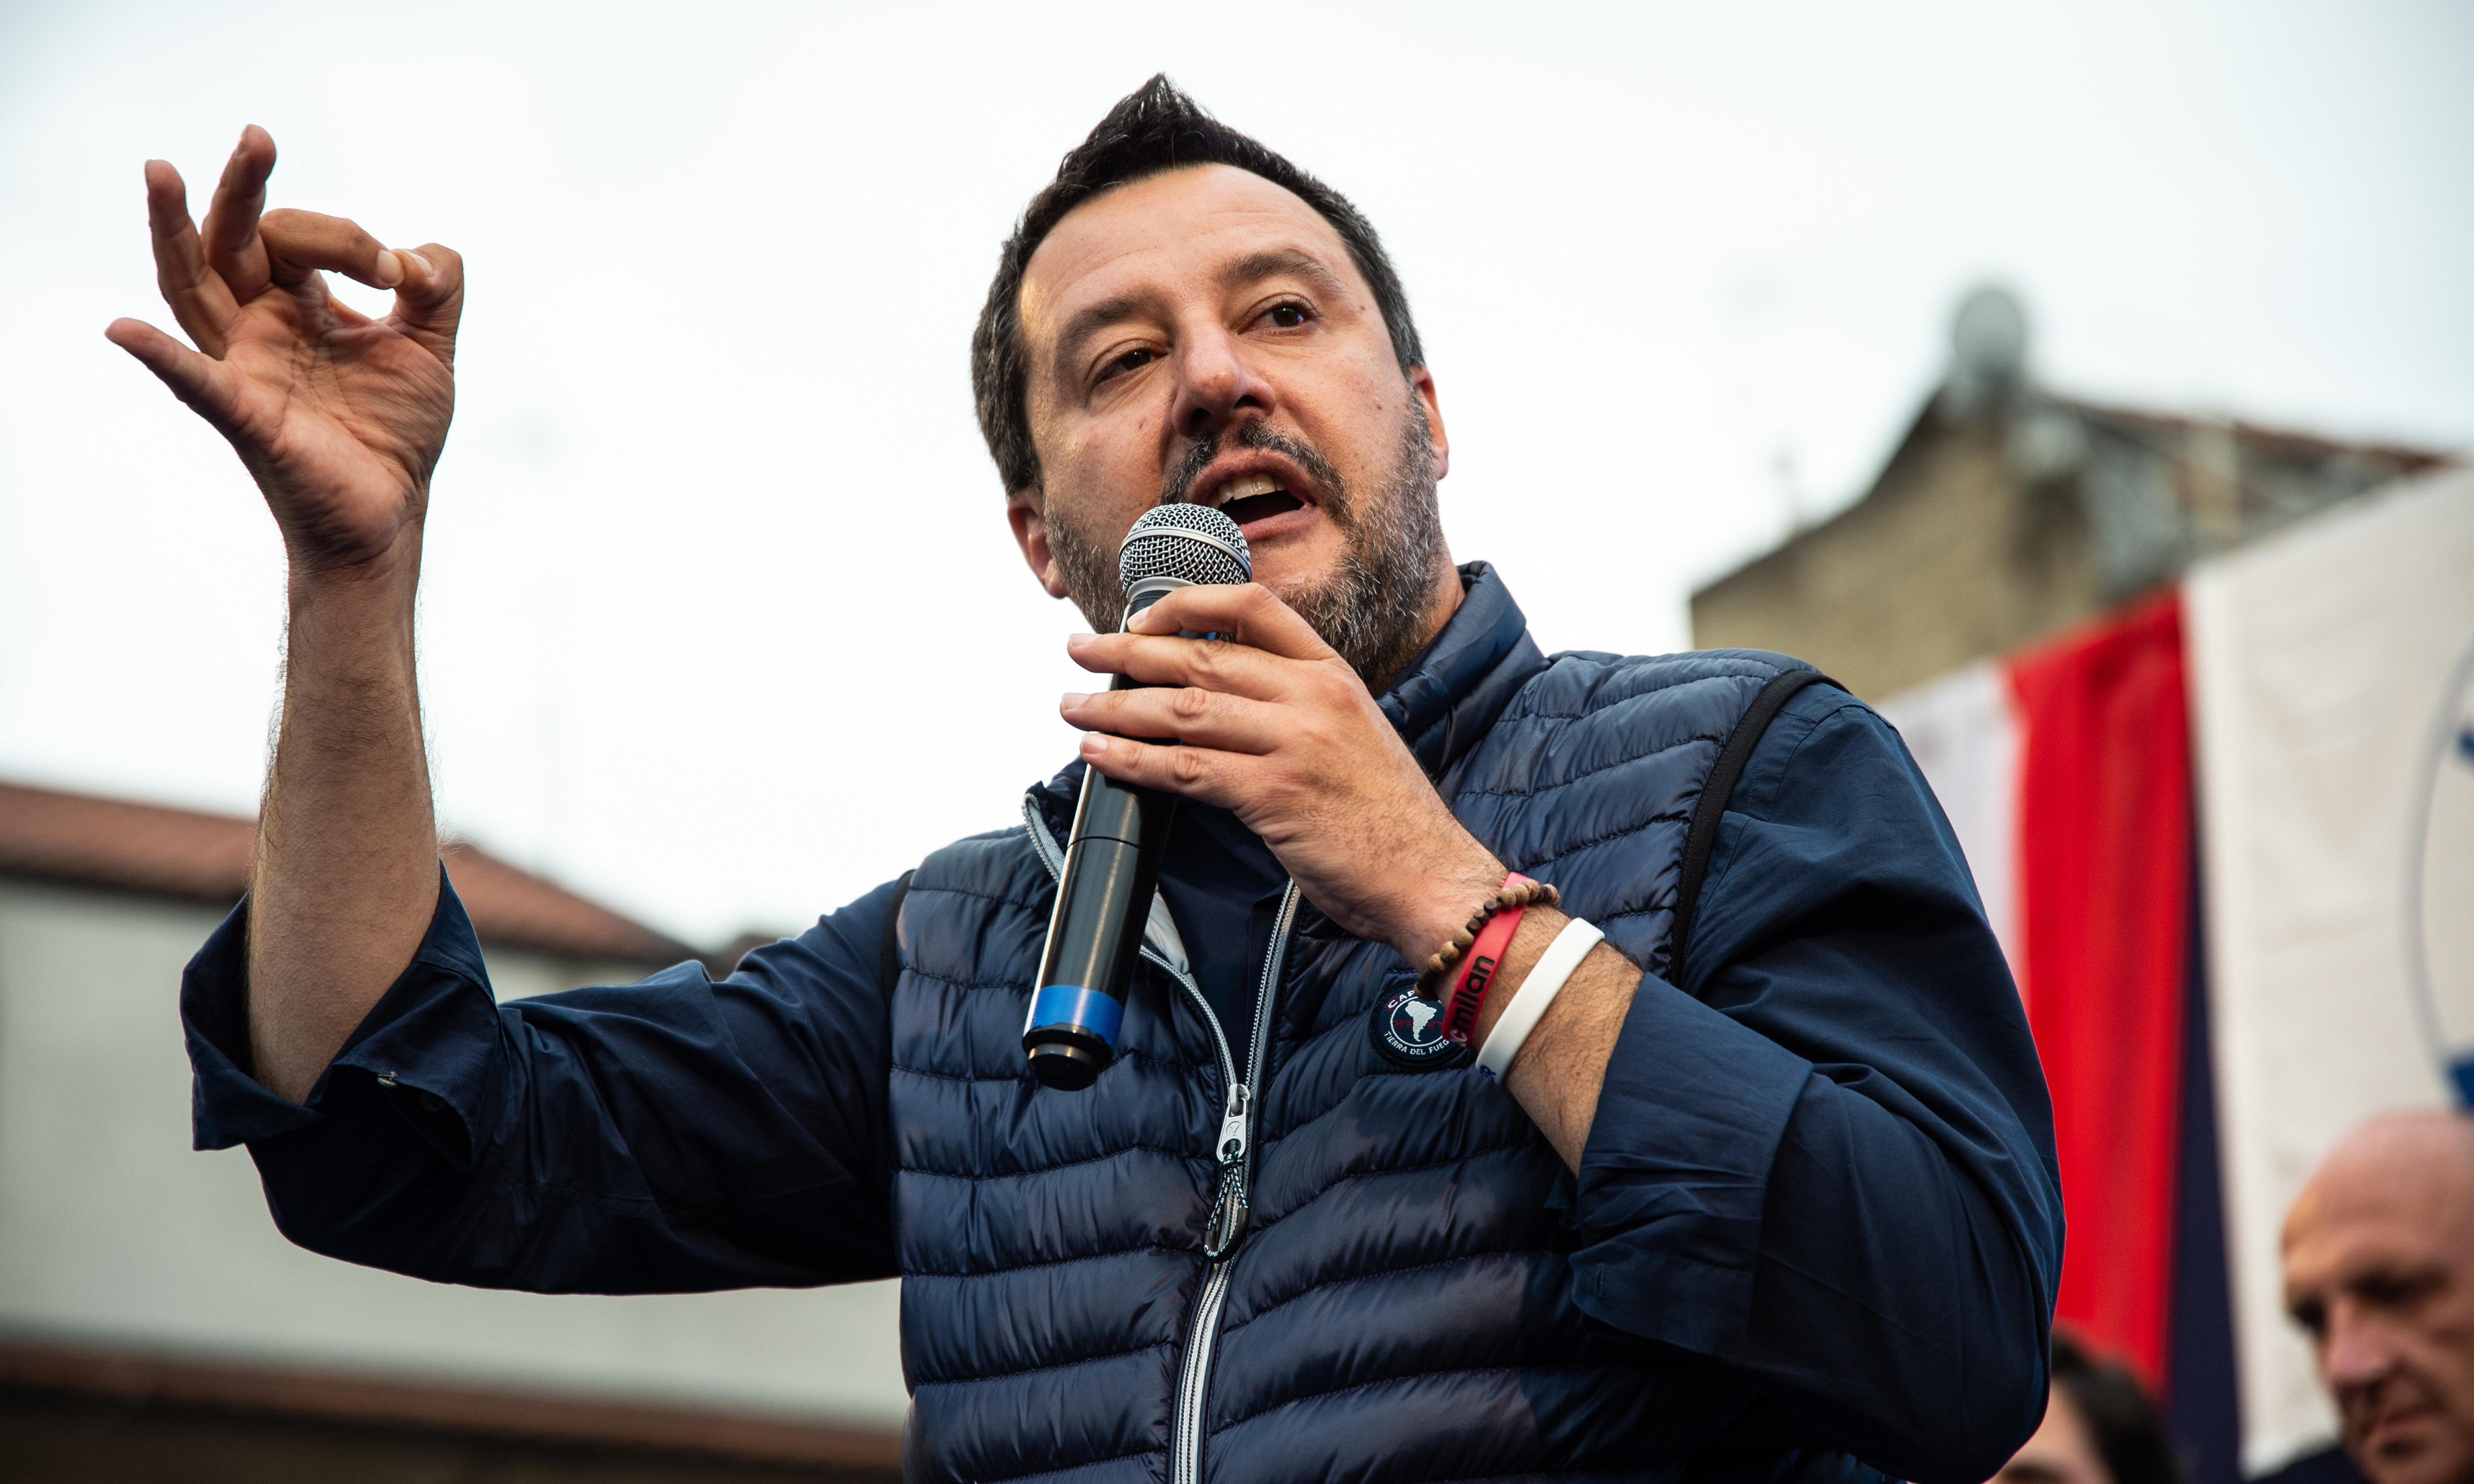 Matteo Salvini seeks closer Washington ties as EU tensions rise